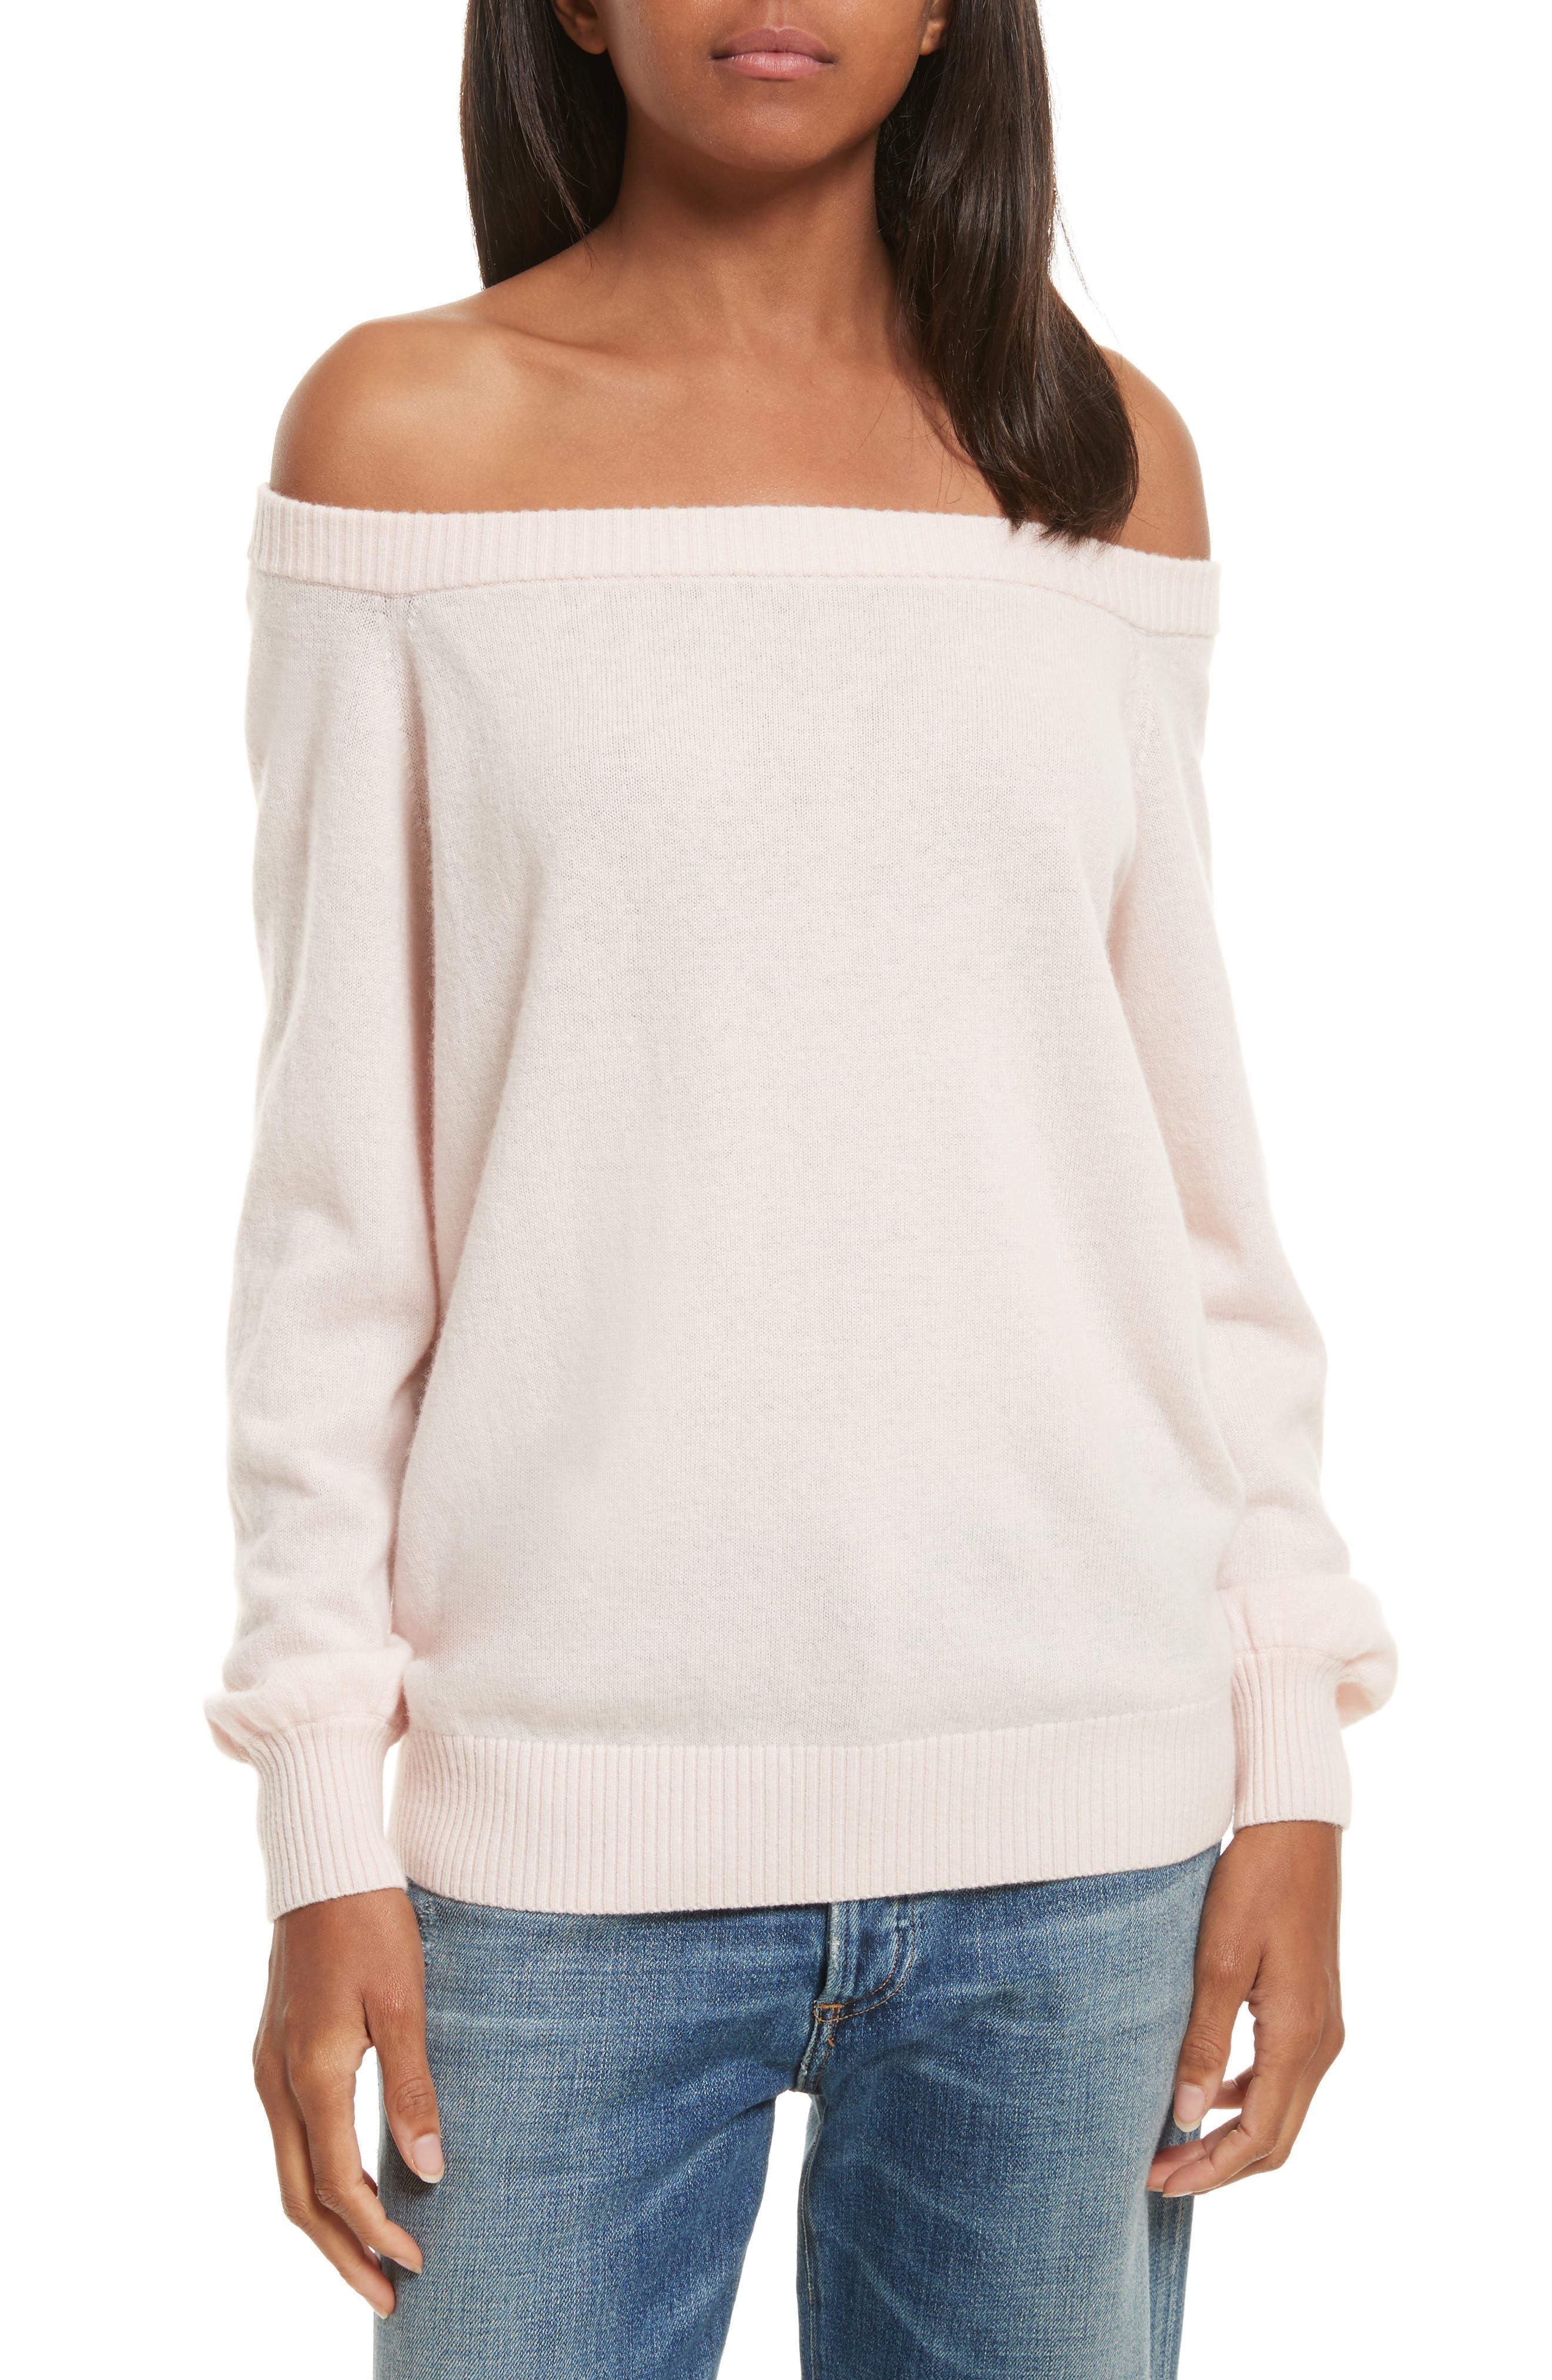 Rebecca Minkoff Shelby Merino Blend Sweater